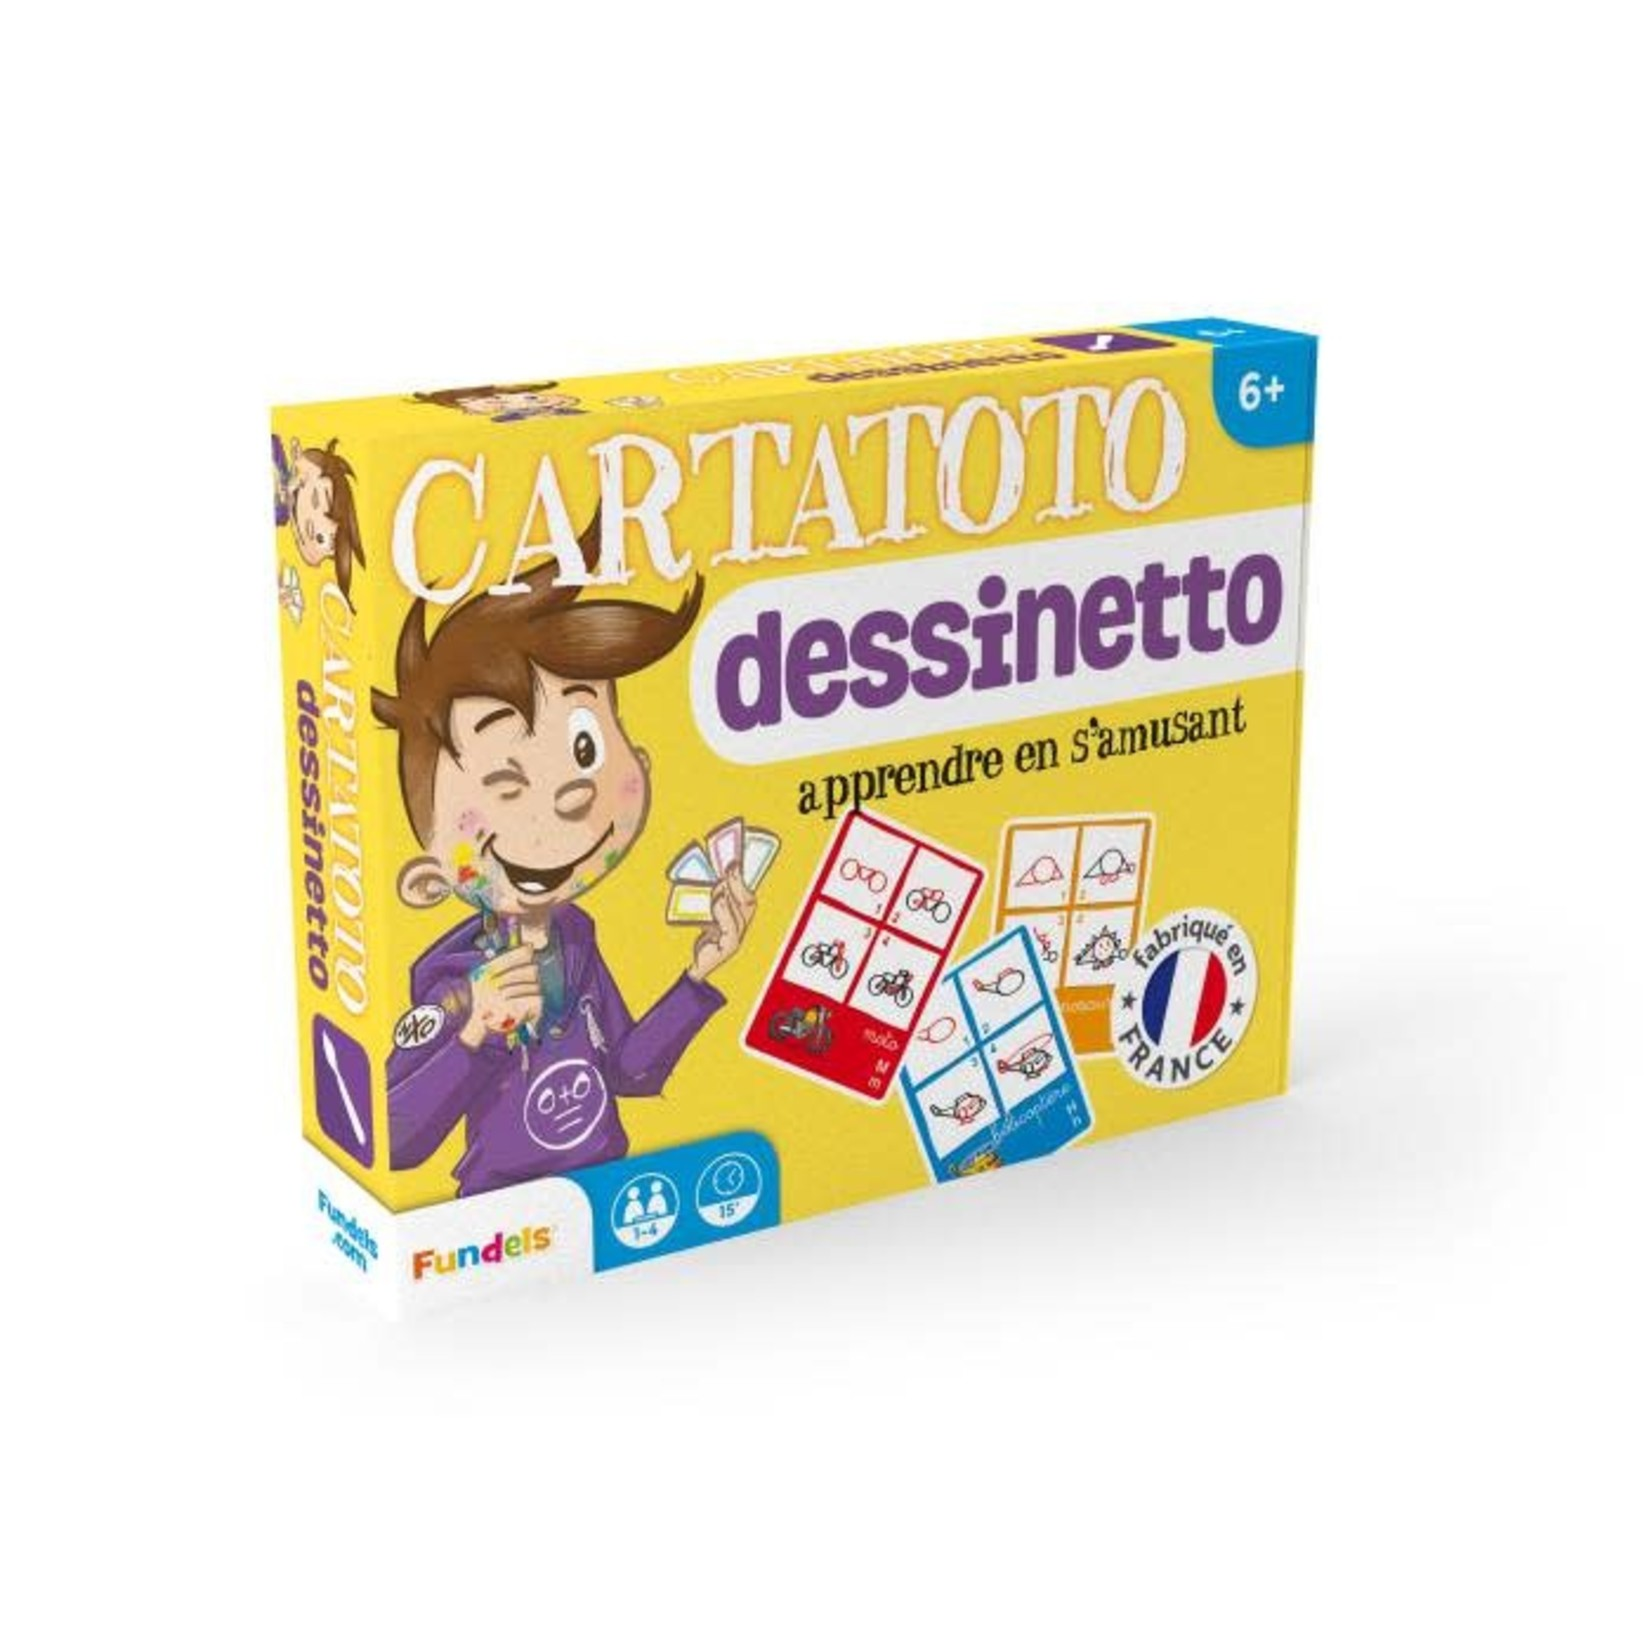 France Cartes Cartatoto Dessinetto (FR)